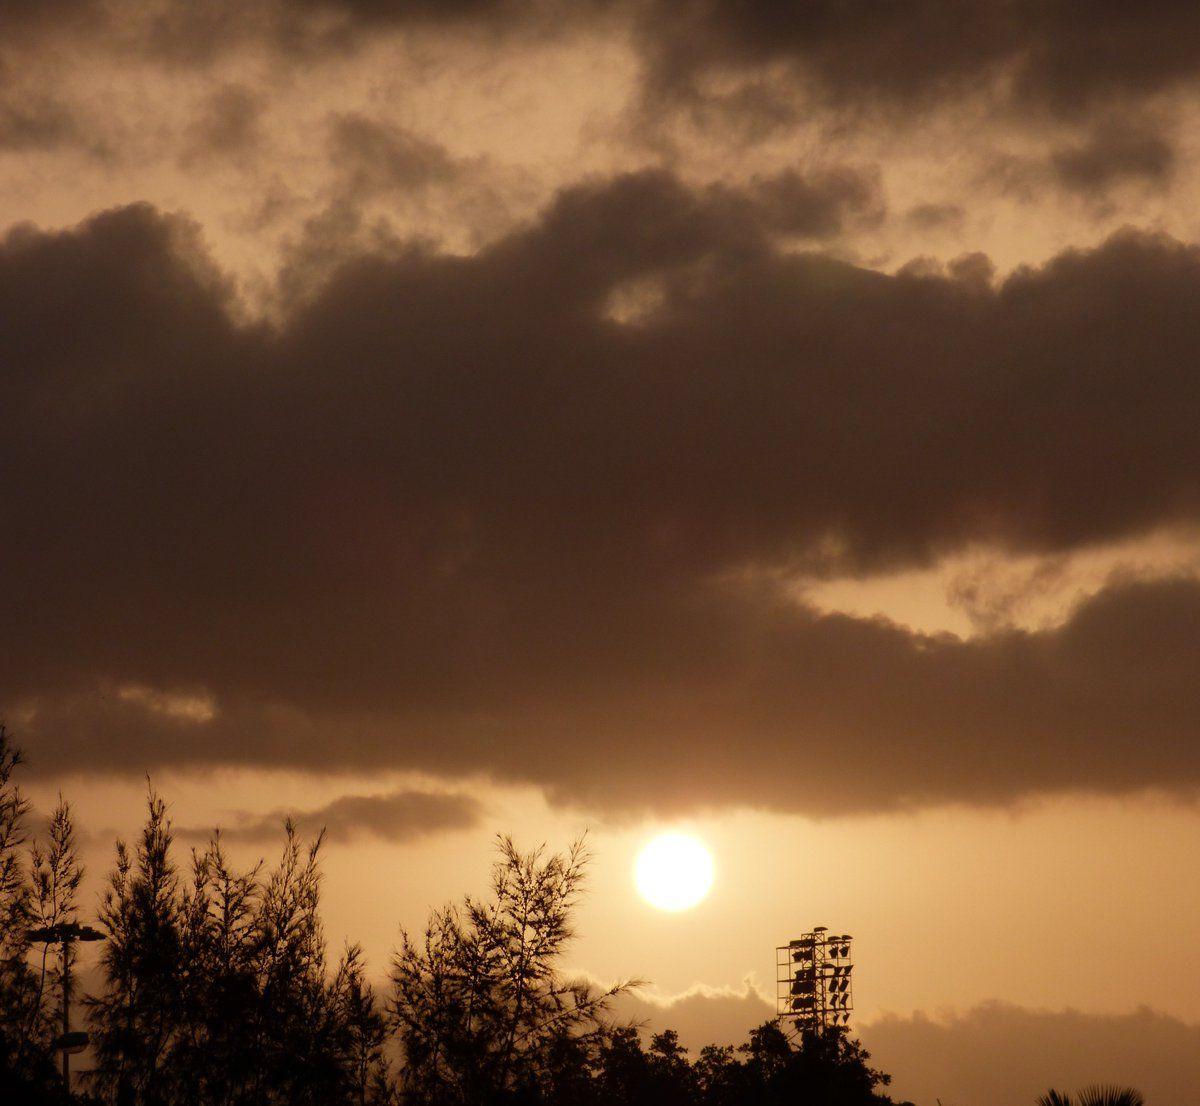 Canary Islands Photography: Amanecer 25 Feb Maspalomas Gran Canaria